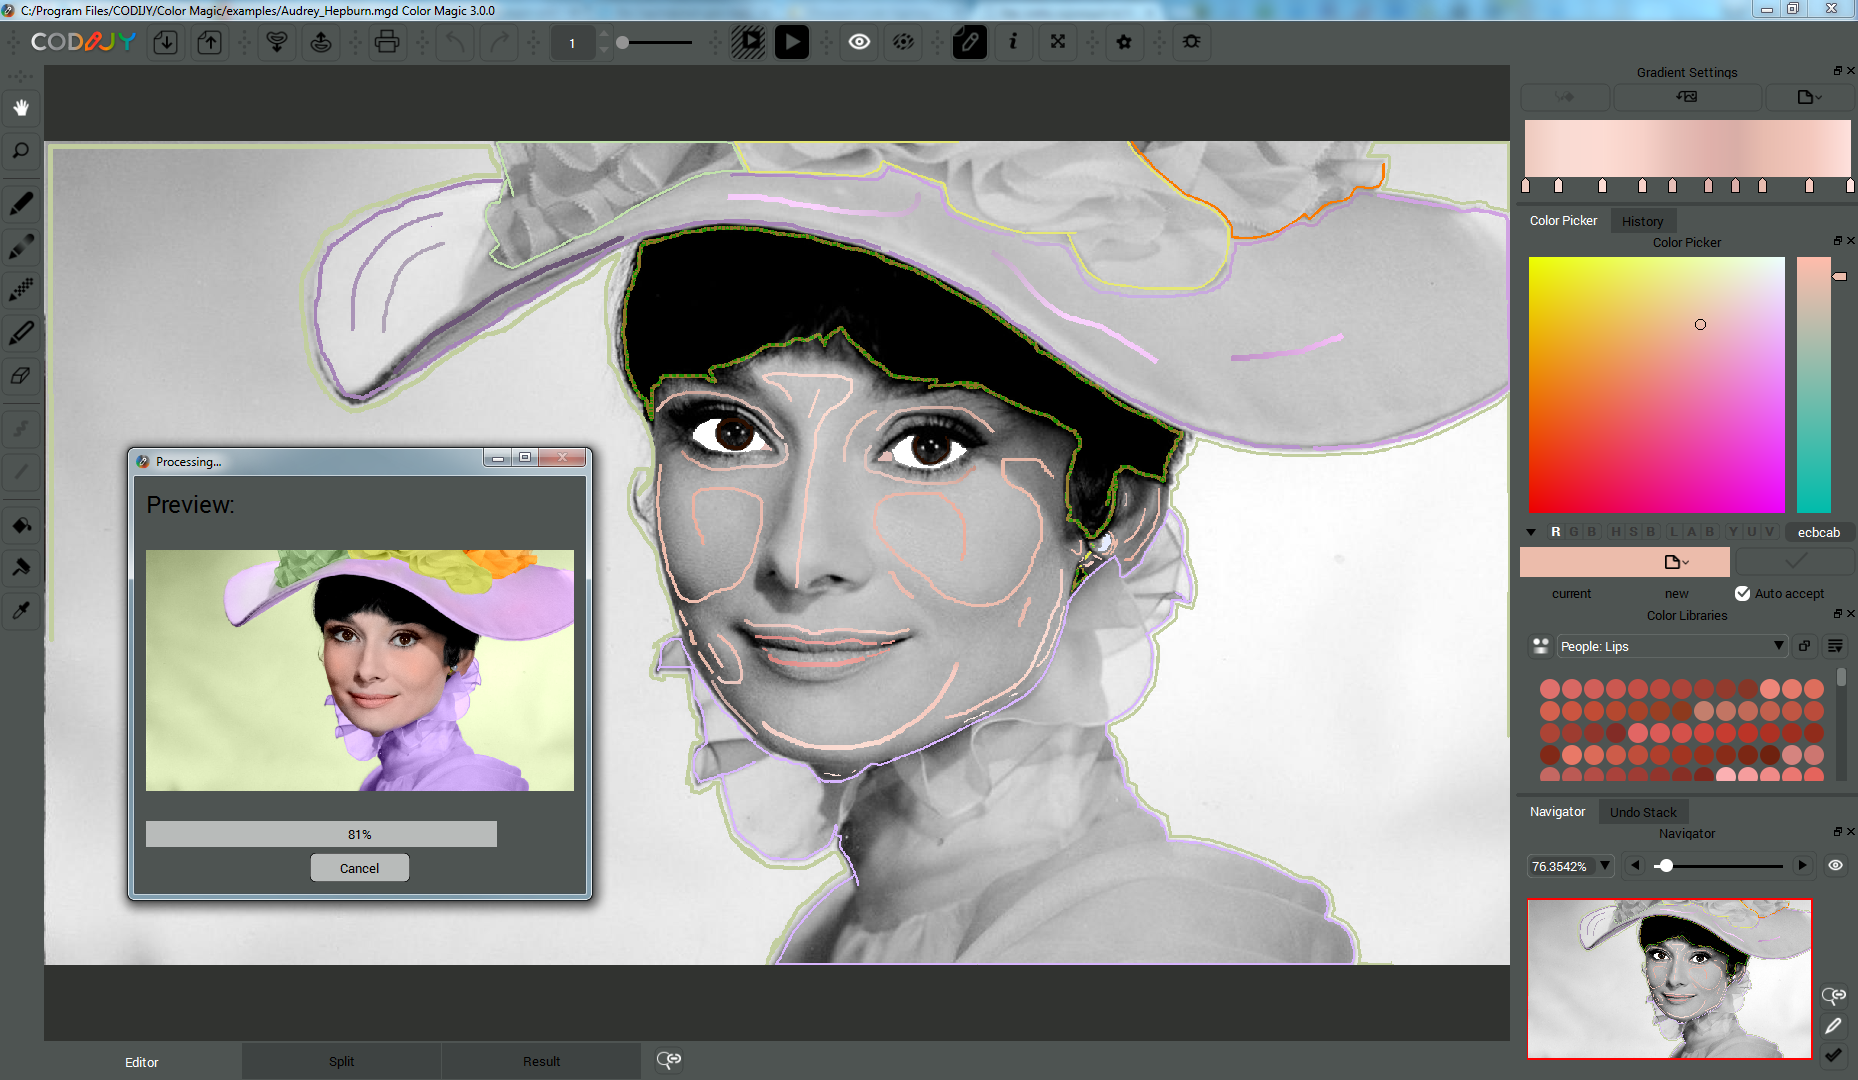 CODIJY Pro, Design, Photo & Graphics Software Screenshot